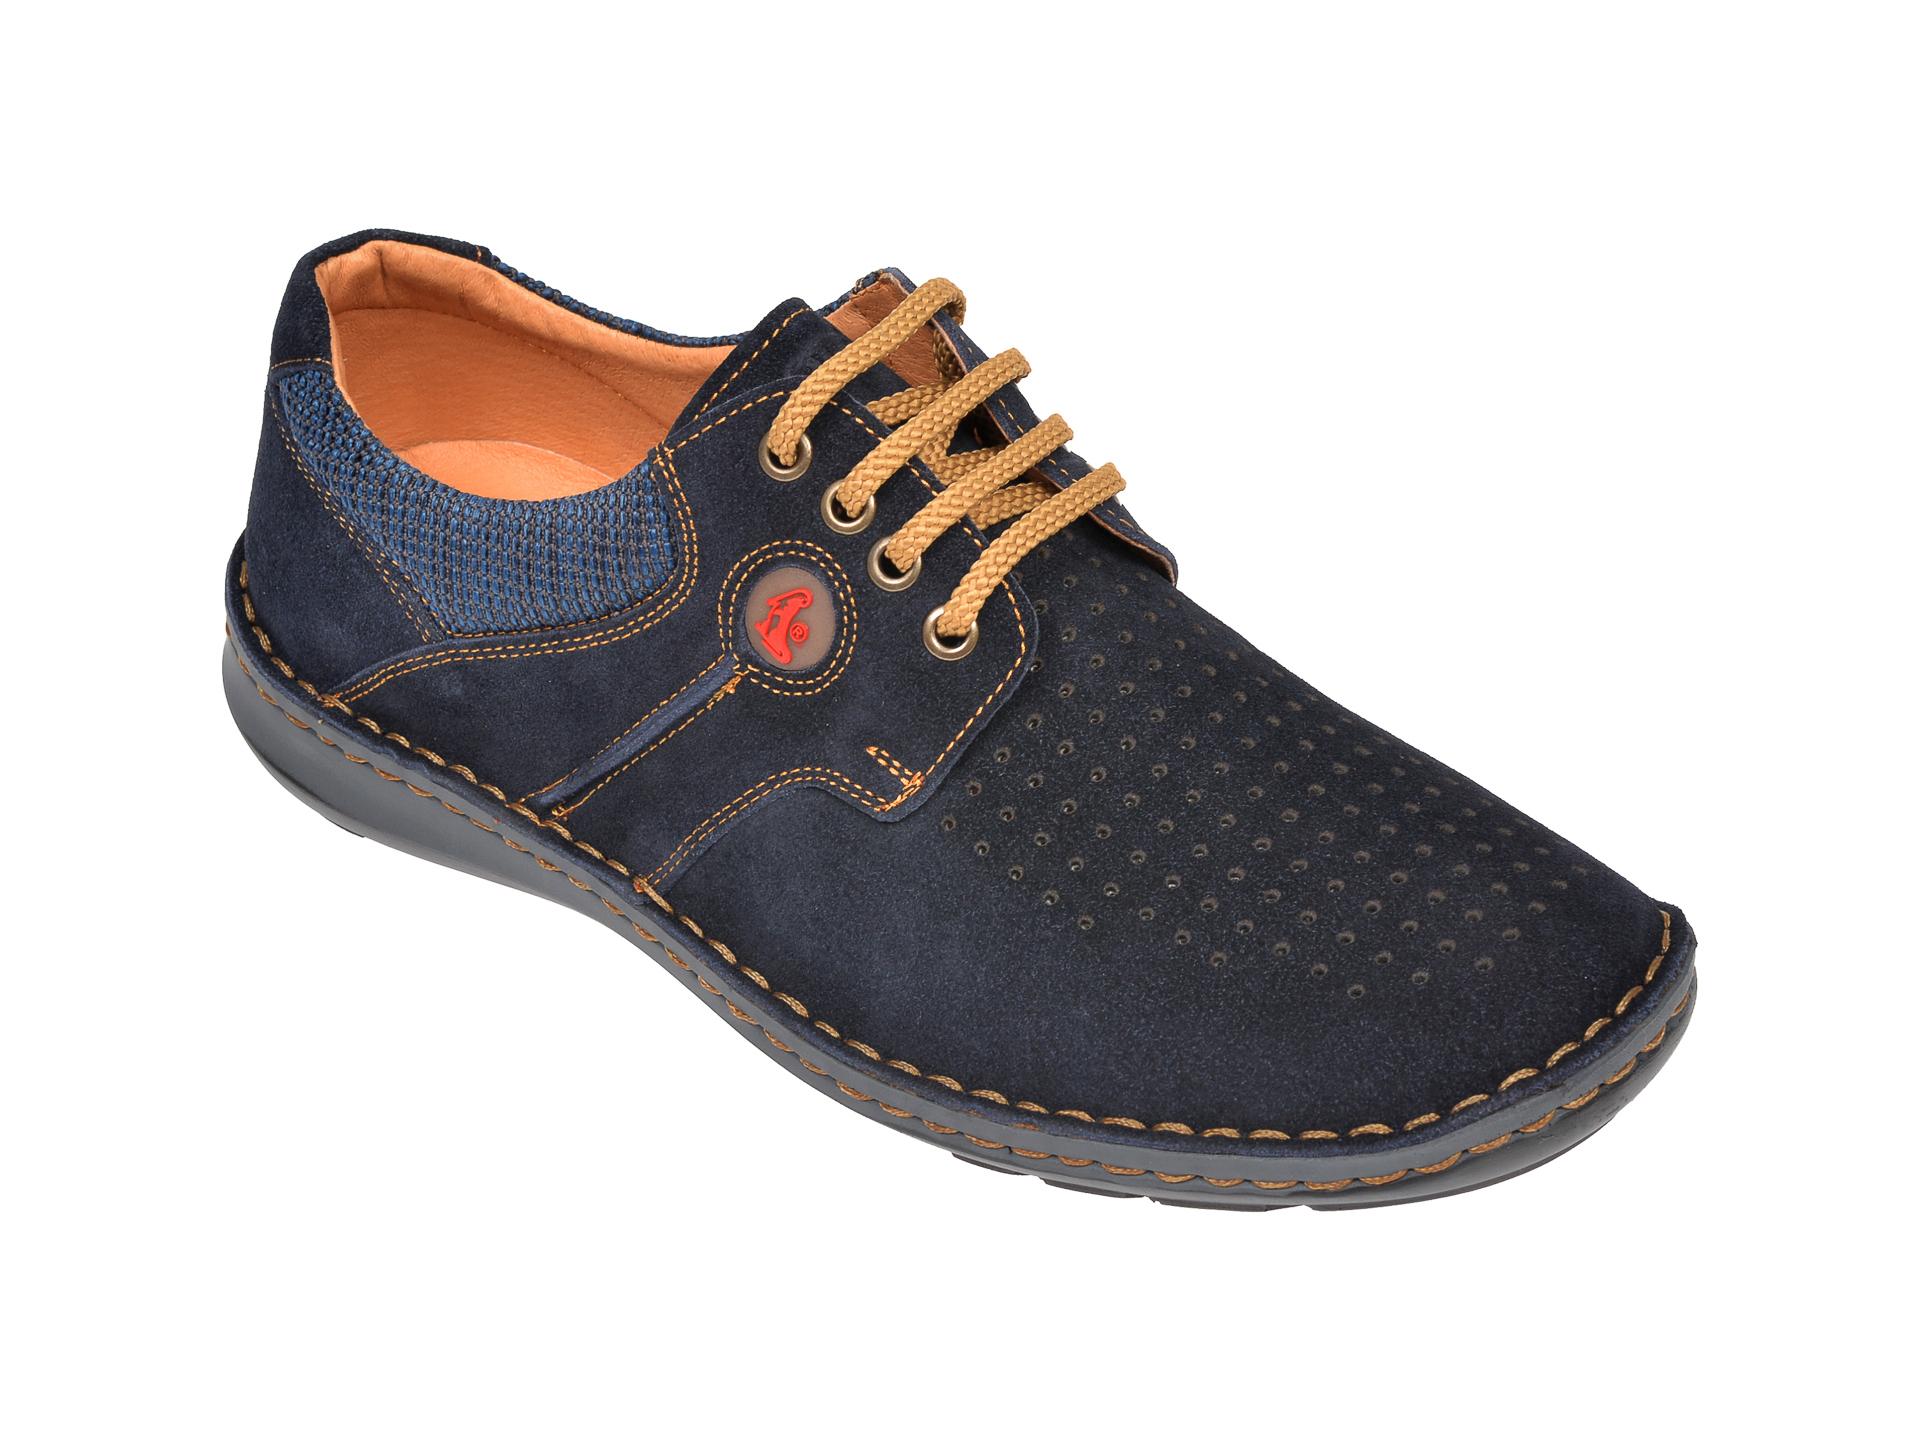 Pantofi Otter Bleumarin, 9560, Din Piele Intoarsa